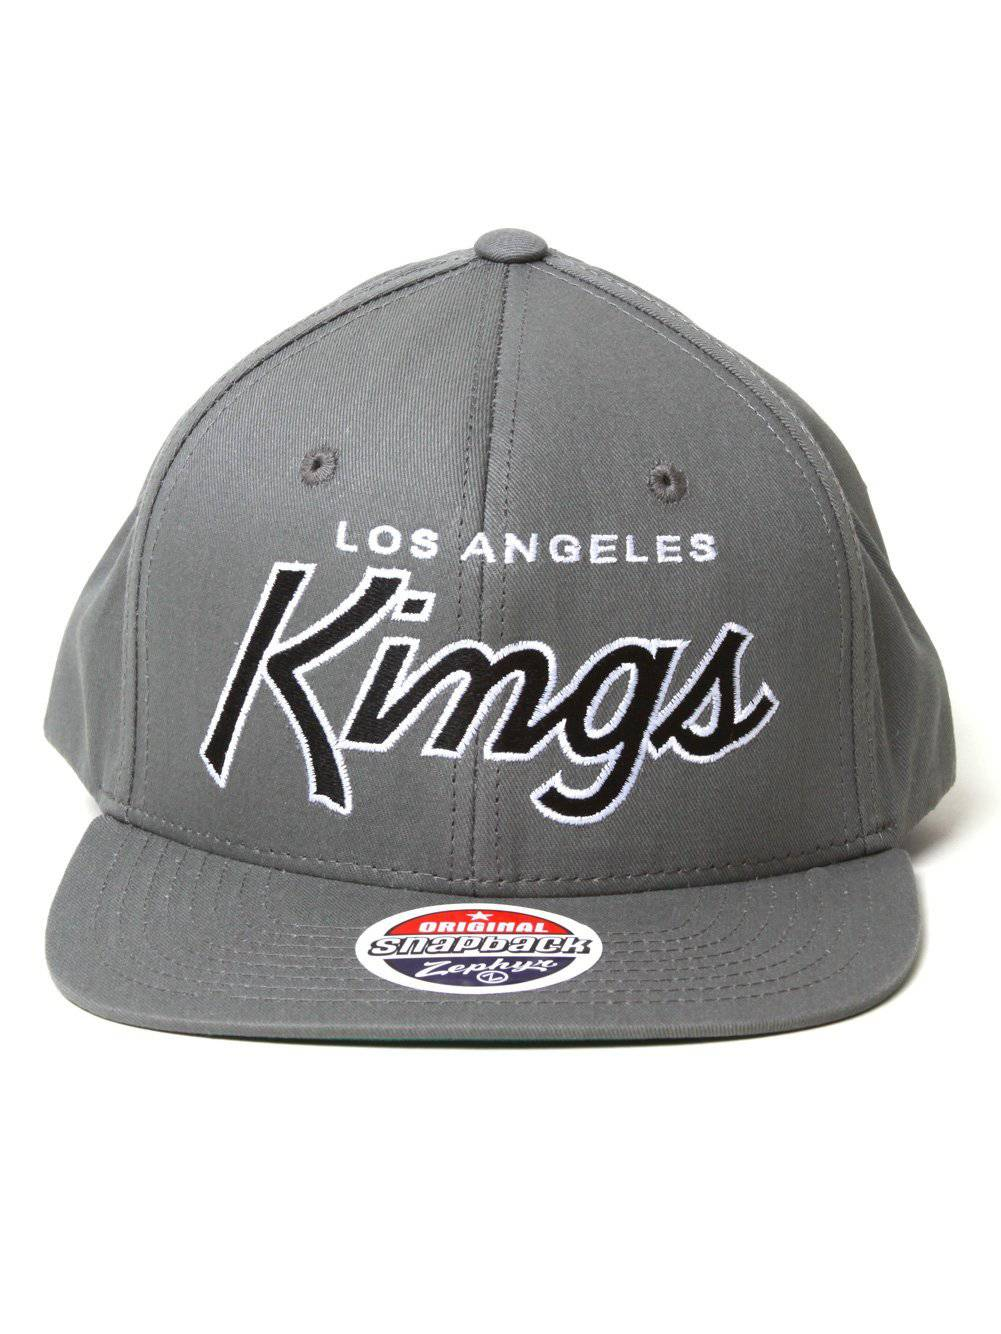 Zephyr NHL Los Angeles Kings Script Snapback Hat 66b1ce5ab7a